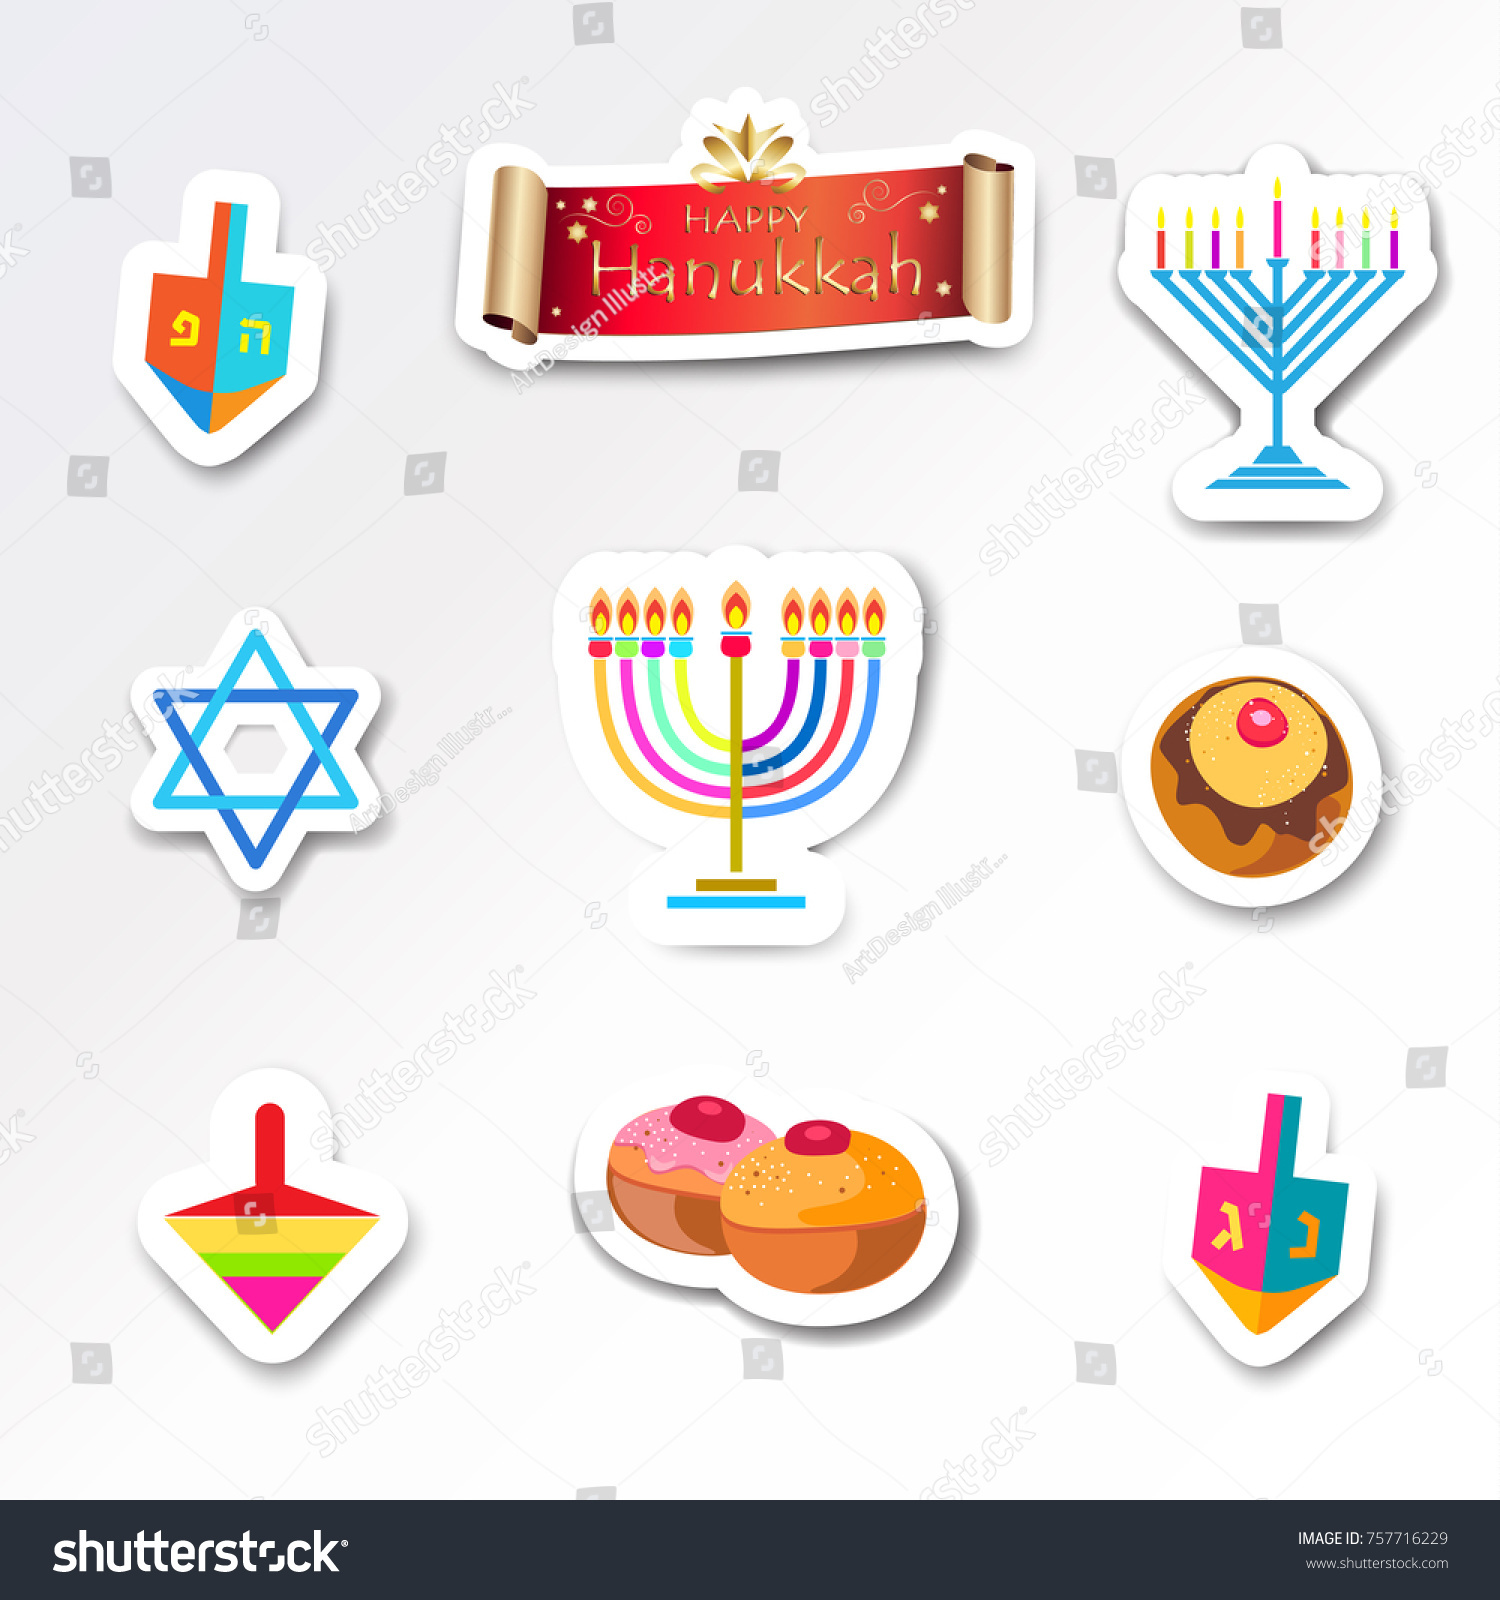 Hanukkah holiday greeting poster traditional symbols stock vector hanukkah holiday greeting poster traditional symbols donuts cakes dreidel spinning top menorah candles with biocorpaavc